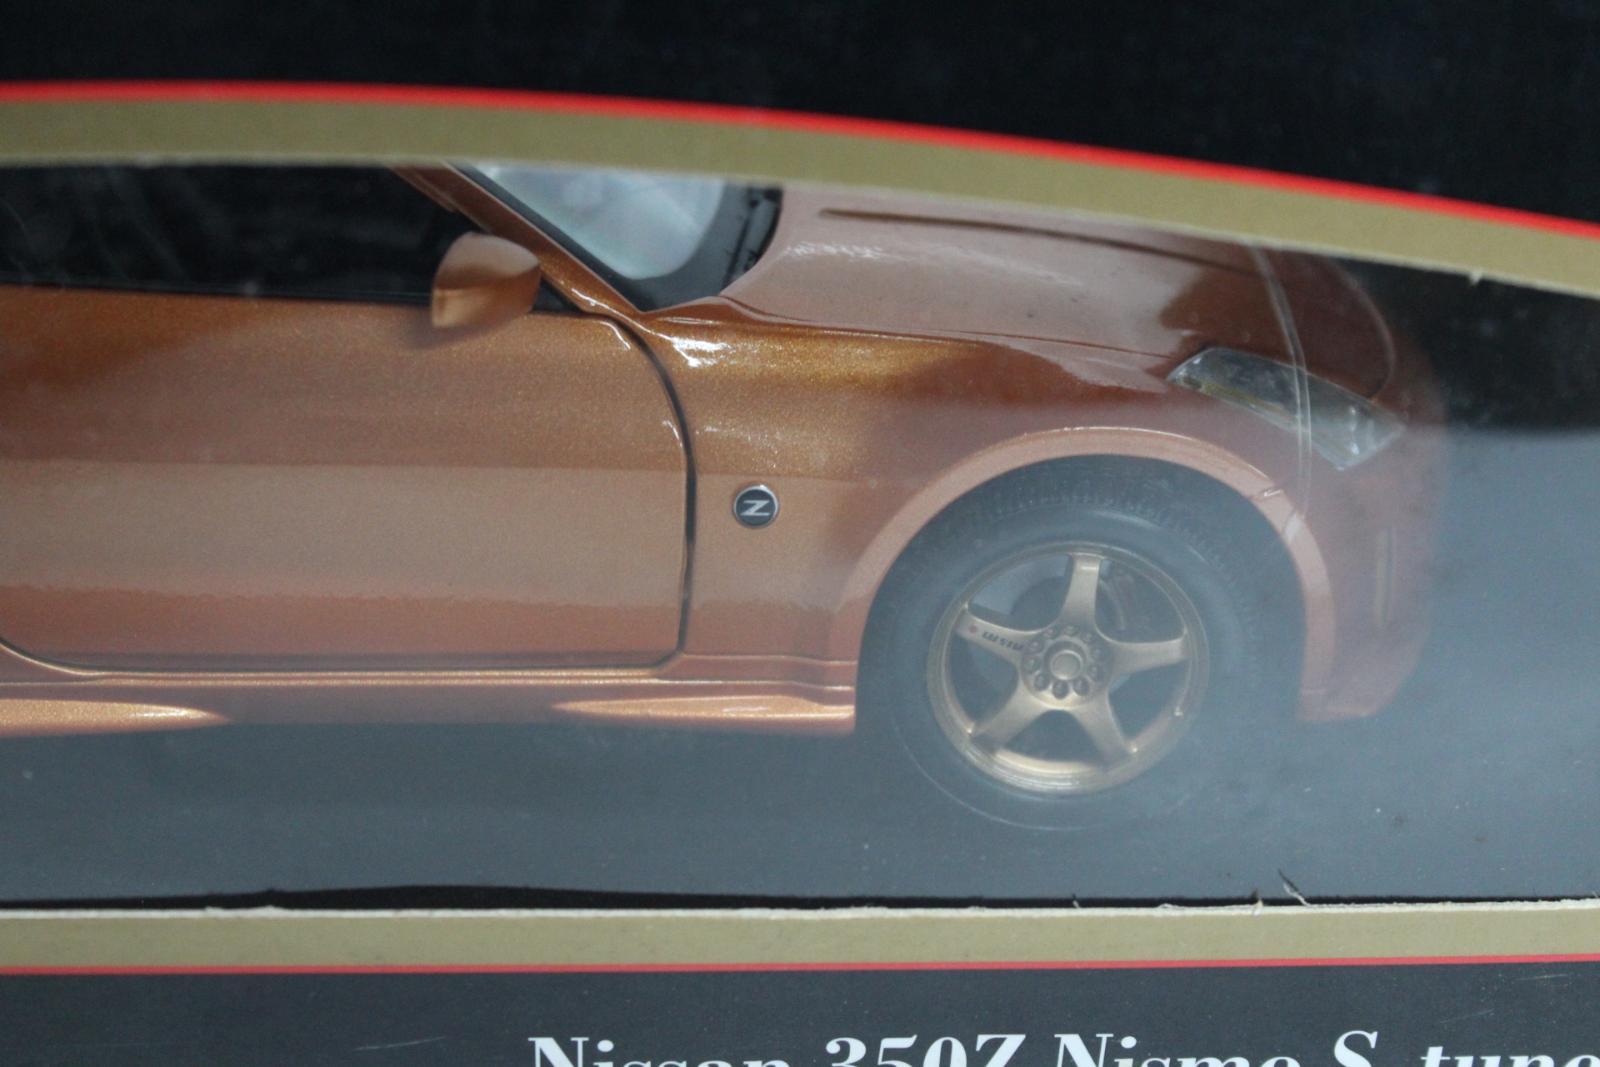 Maisto-31688-EDICIoN-Especial-Nissan-350z-Nismo-S-Tune-1-18-Escala-Modelo-de-Coche-Nuevo miniatura 6